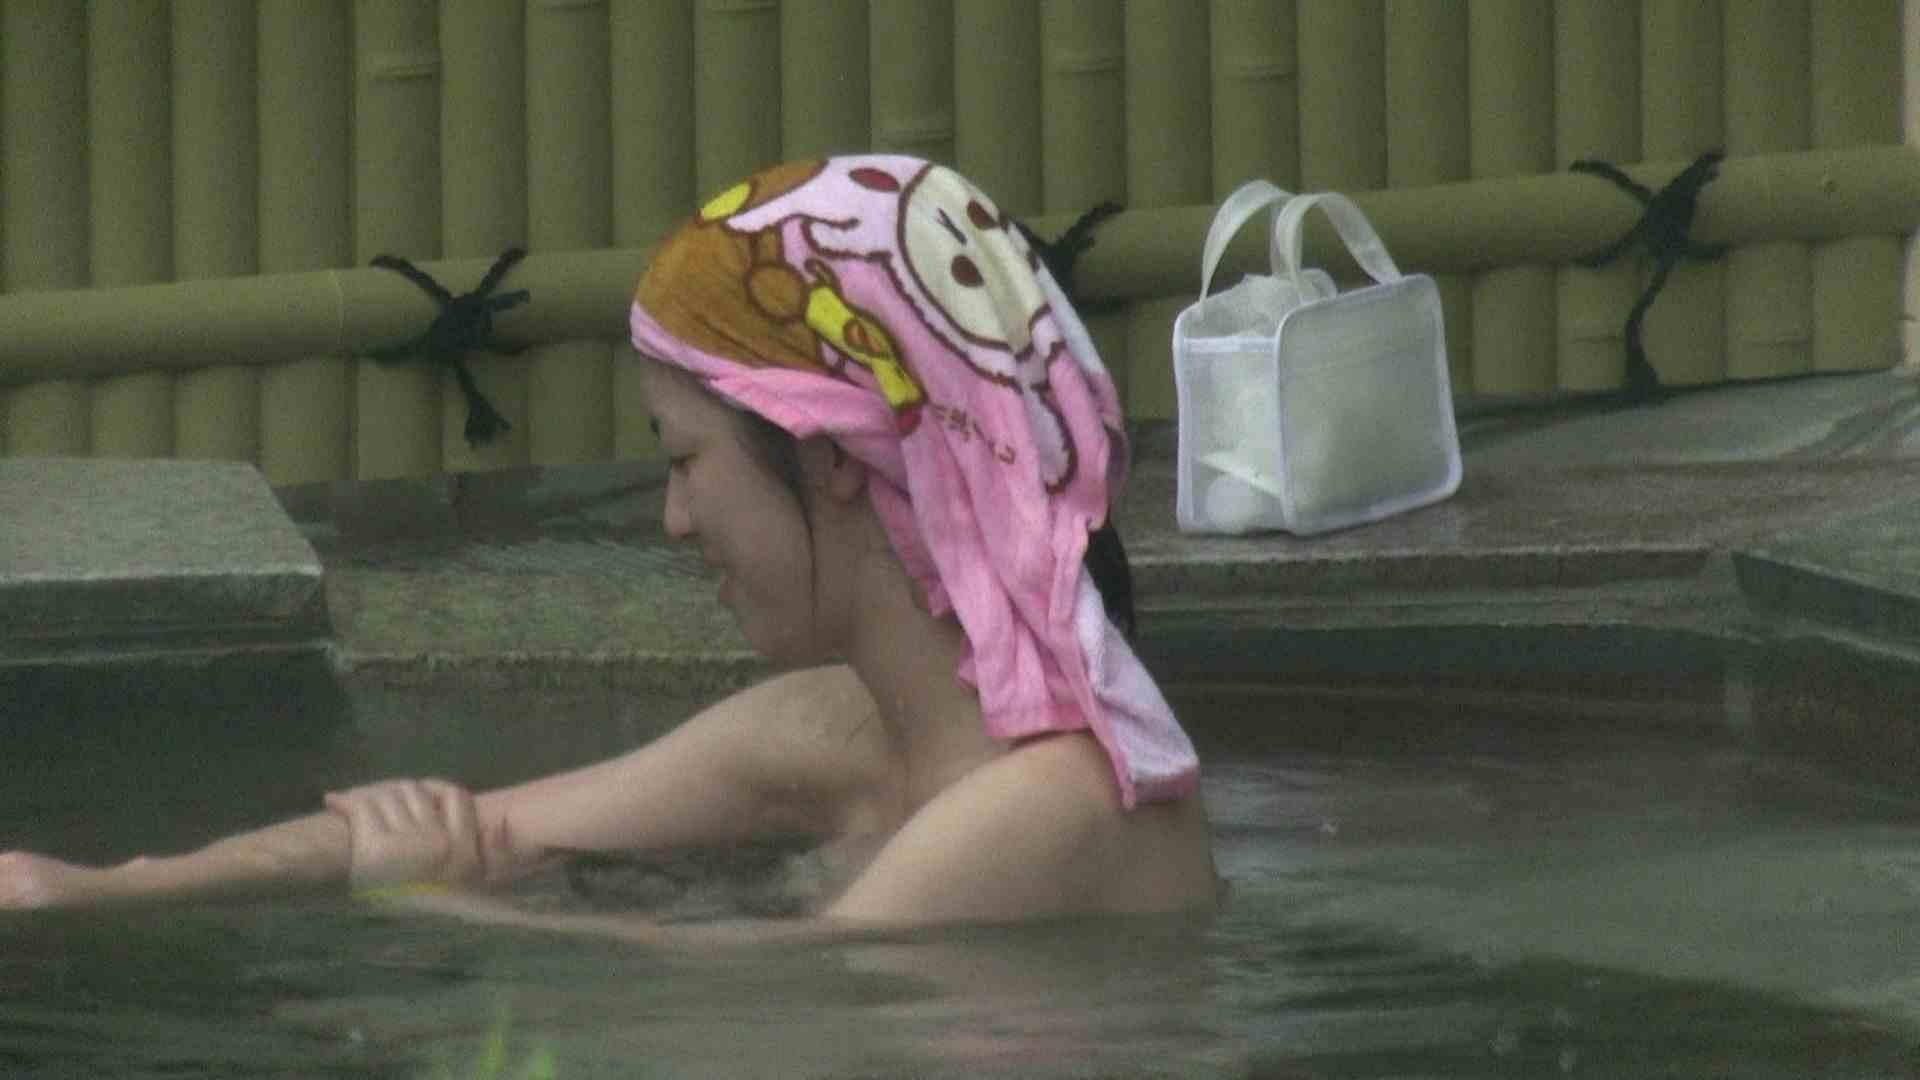 Aquaな露天風呂Vol.171 OLエロ画像 盗撮戯れ無修正画像 108PICs 8